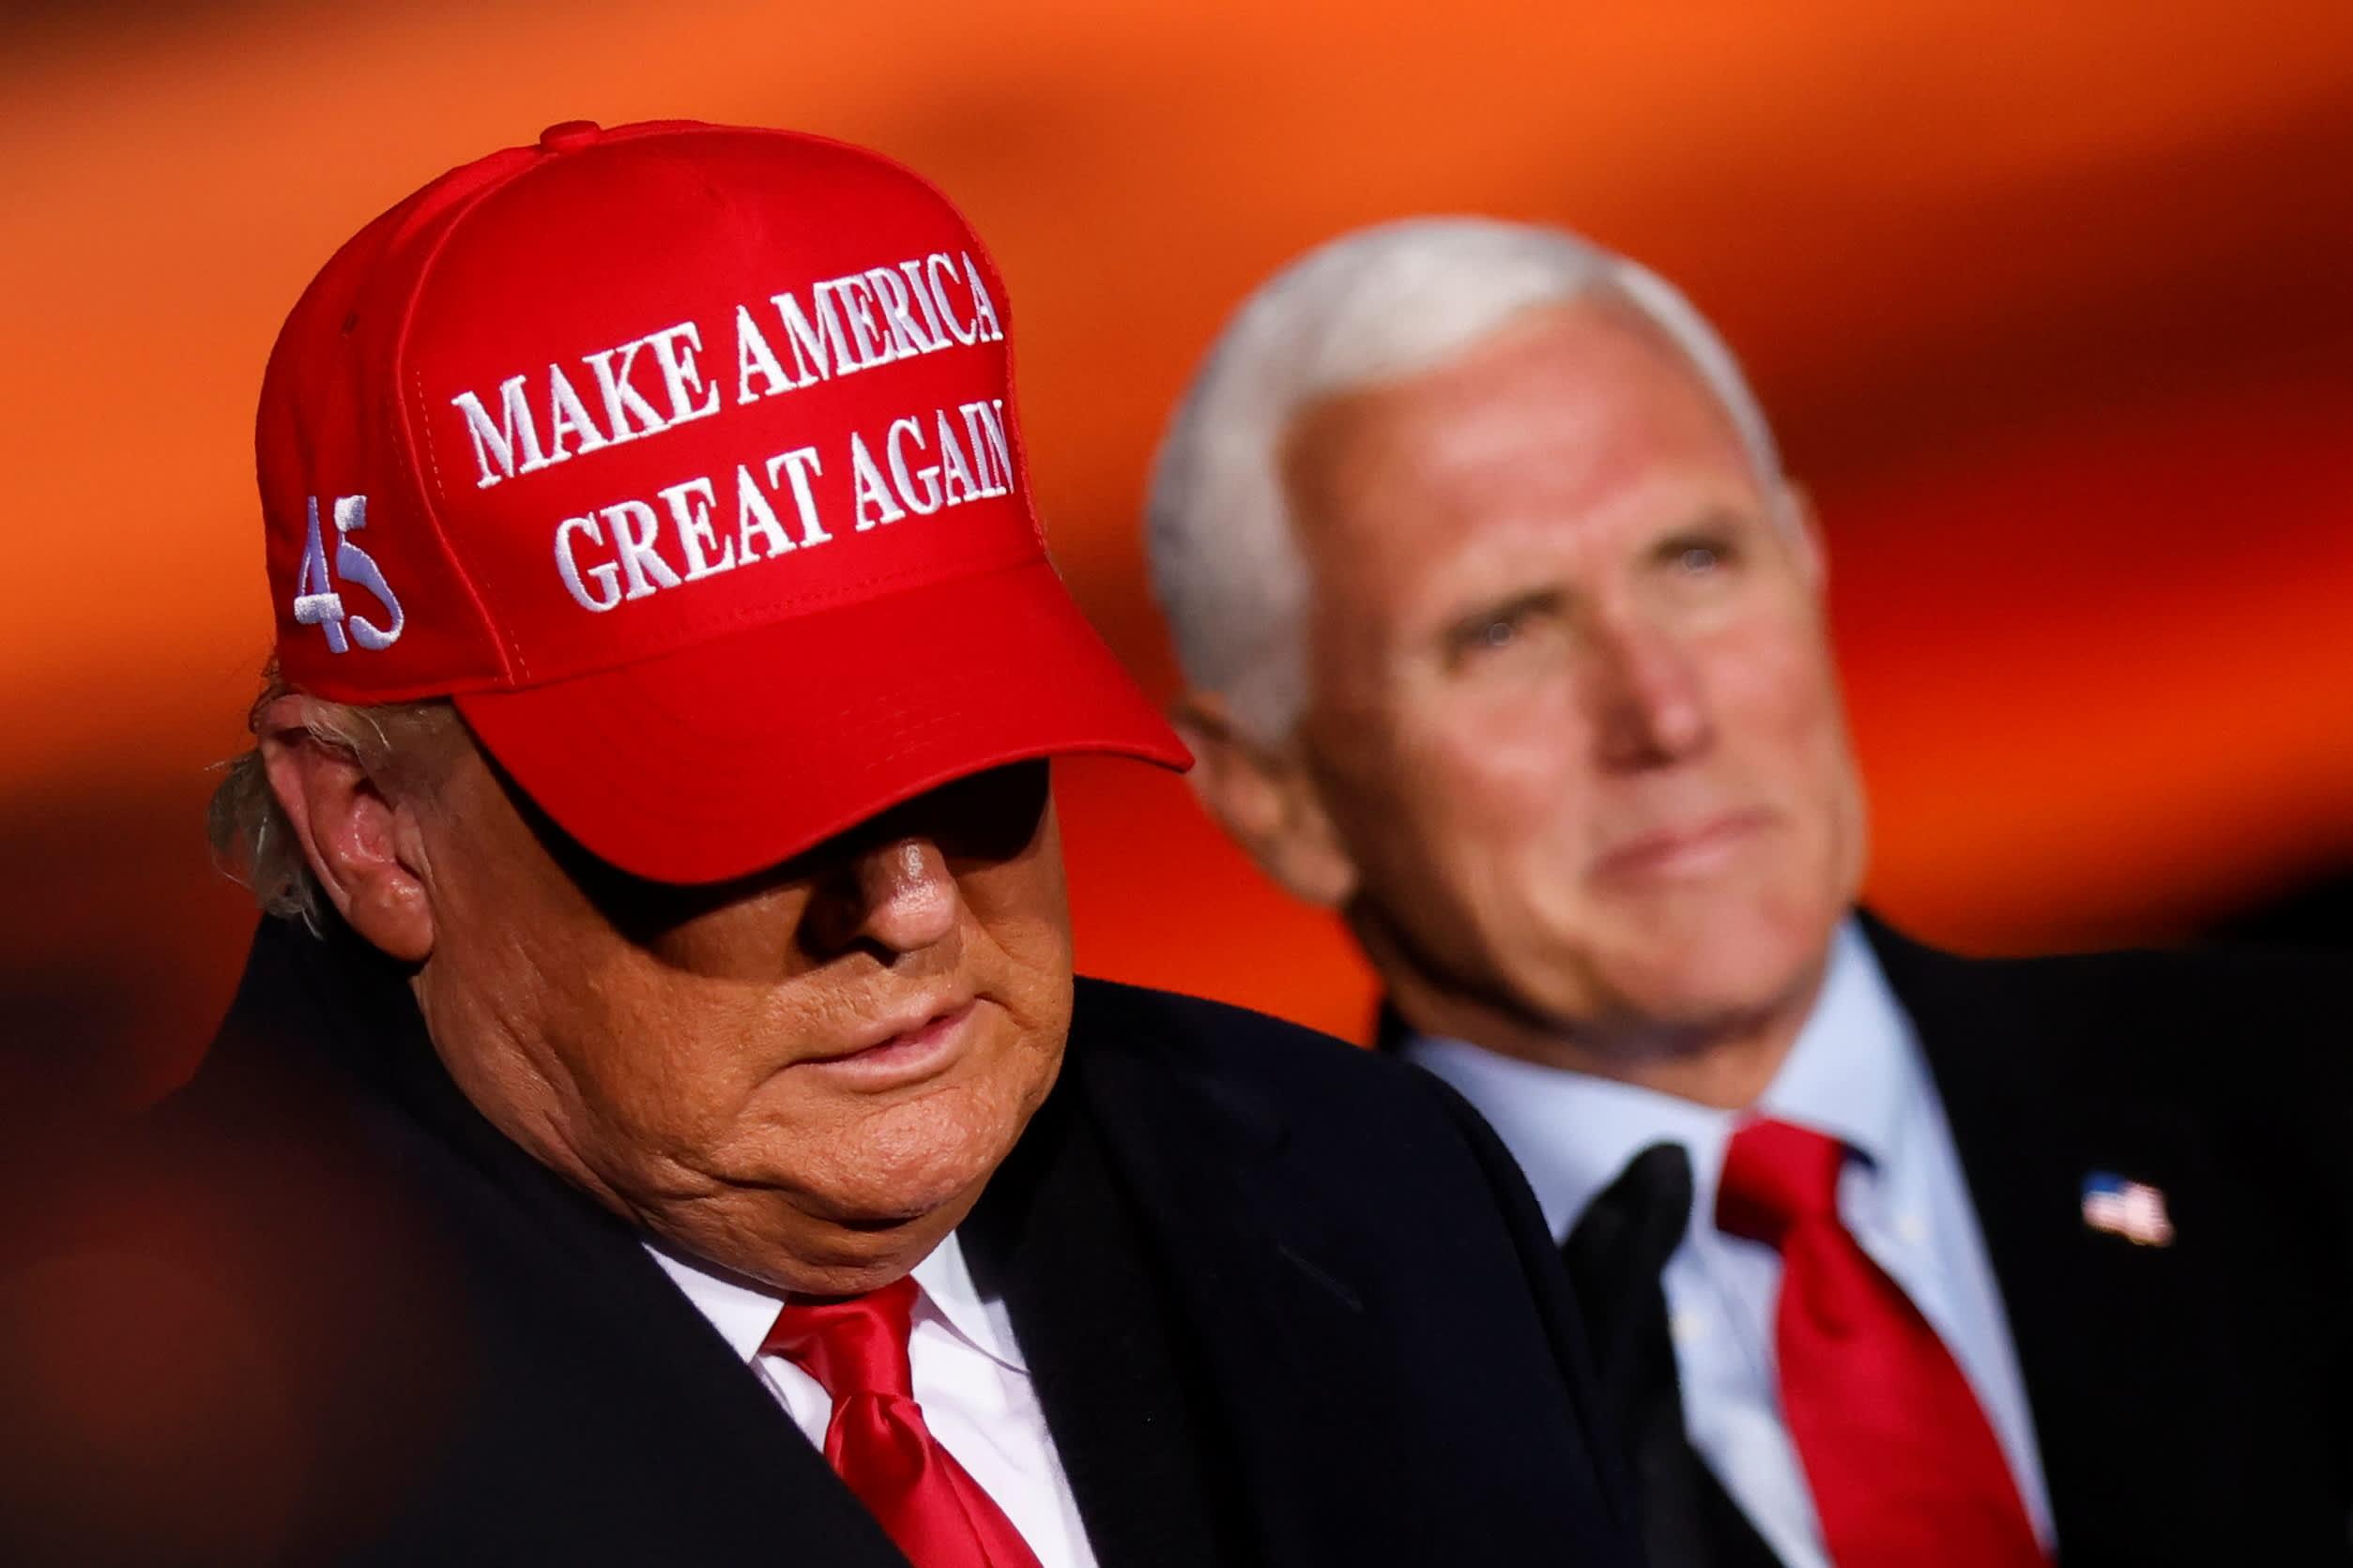 Trump campaign drops Michigan election lawsuit Rudy Giuliani says – CNBC